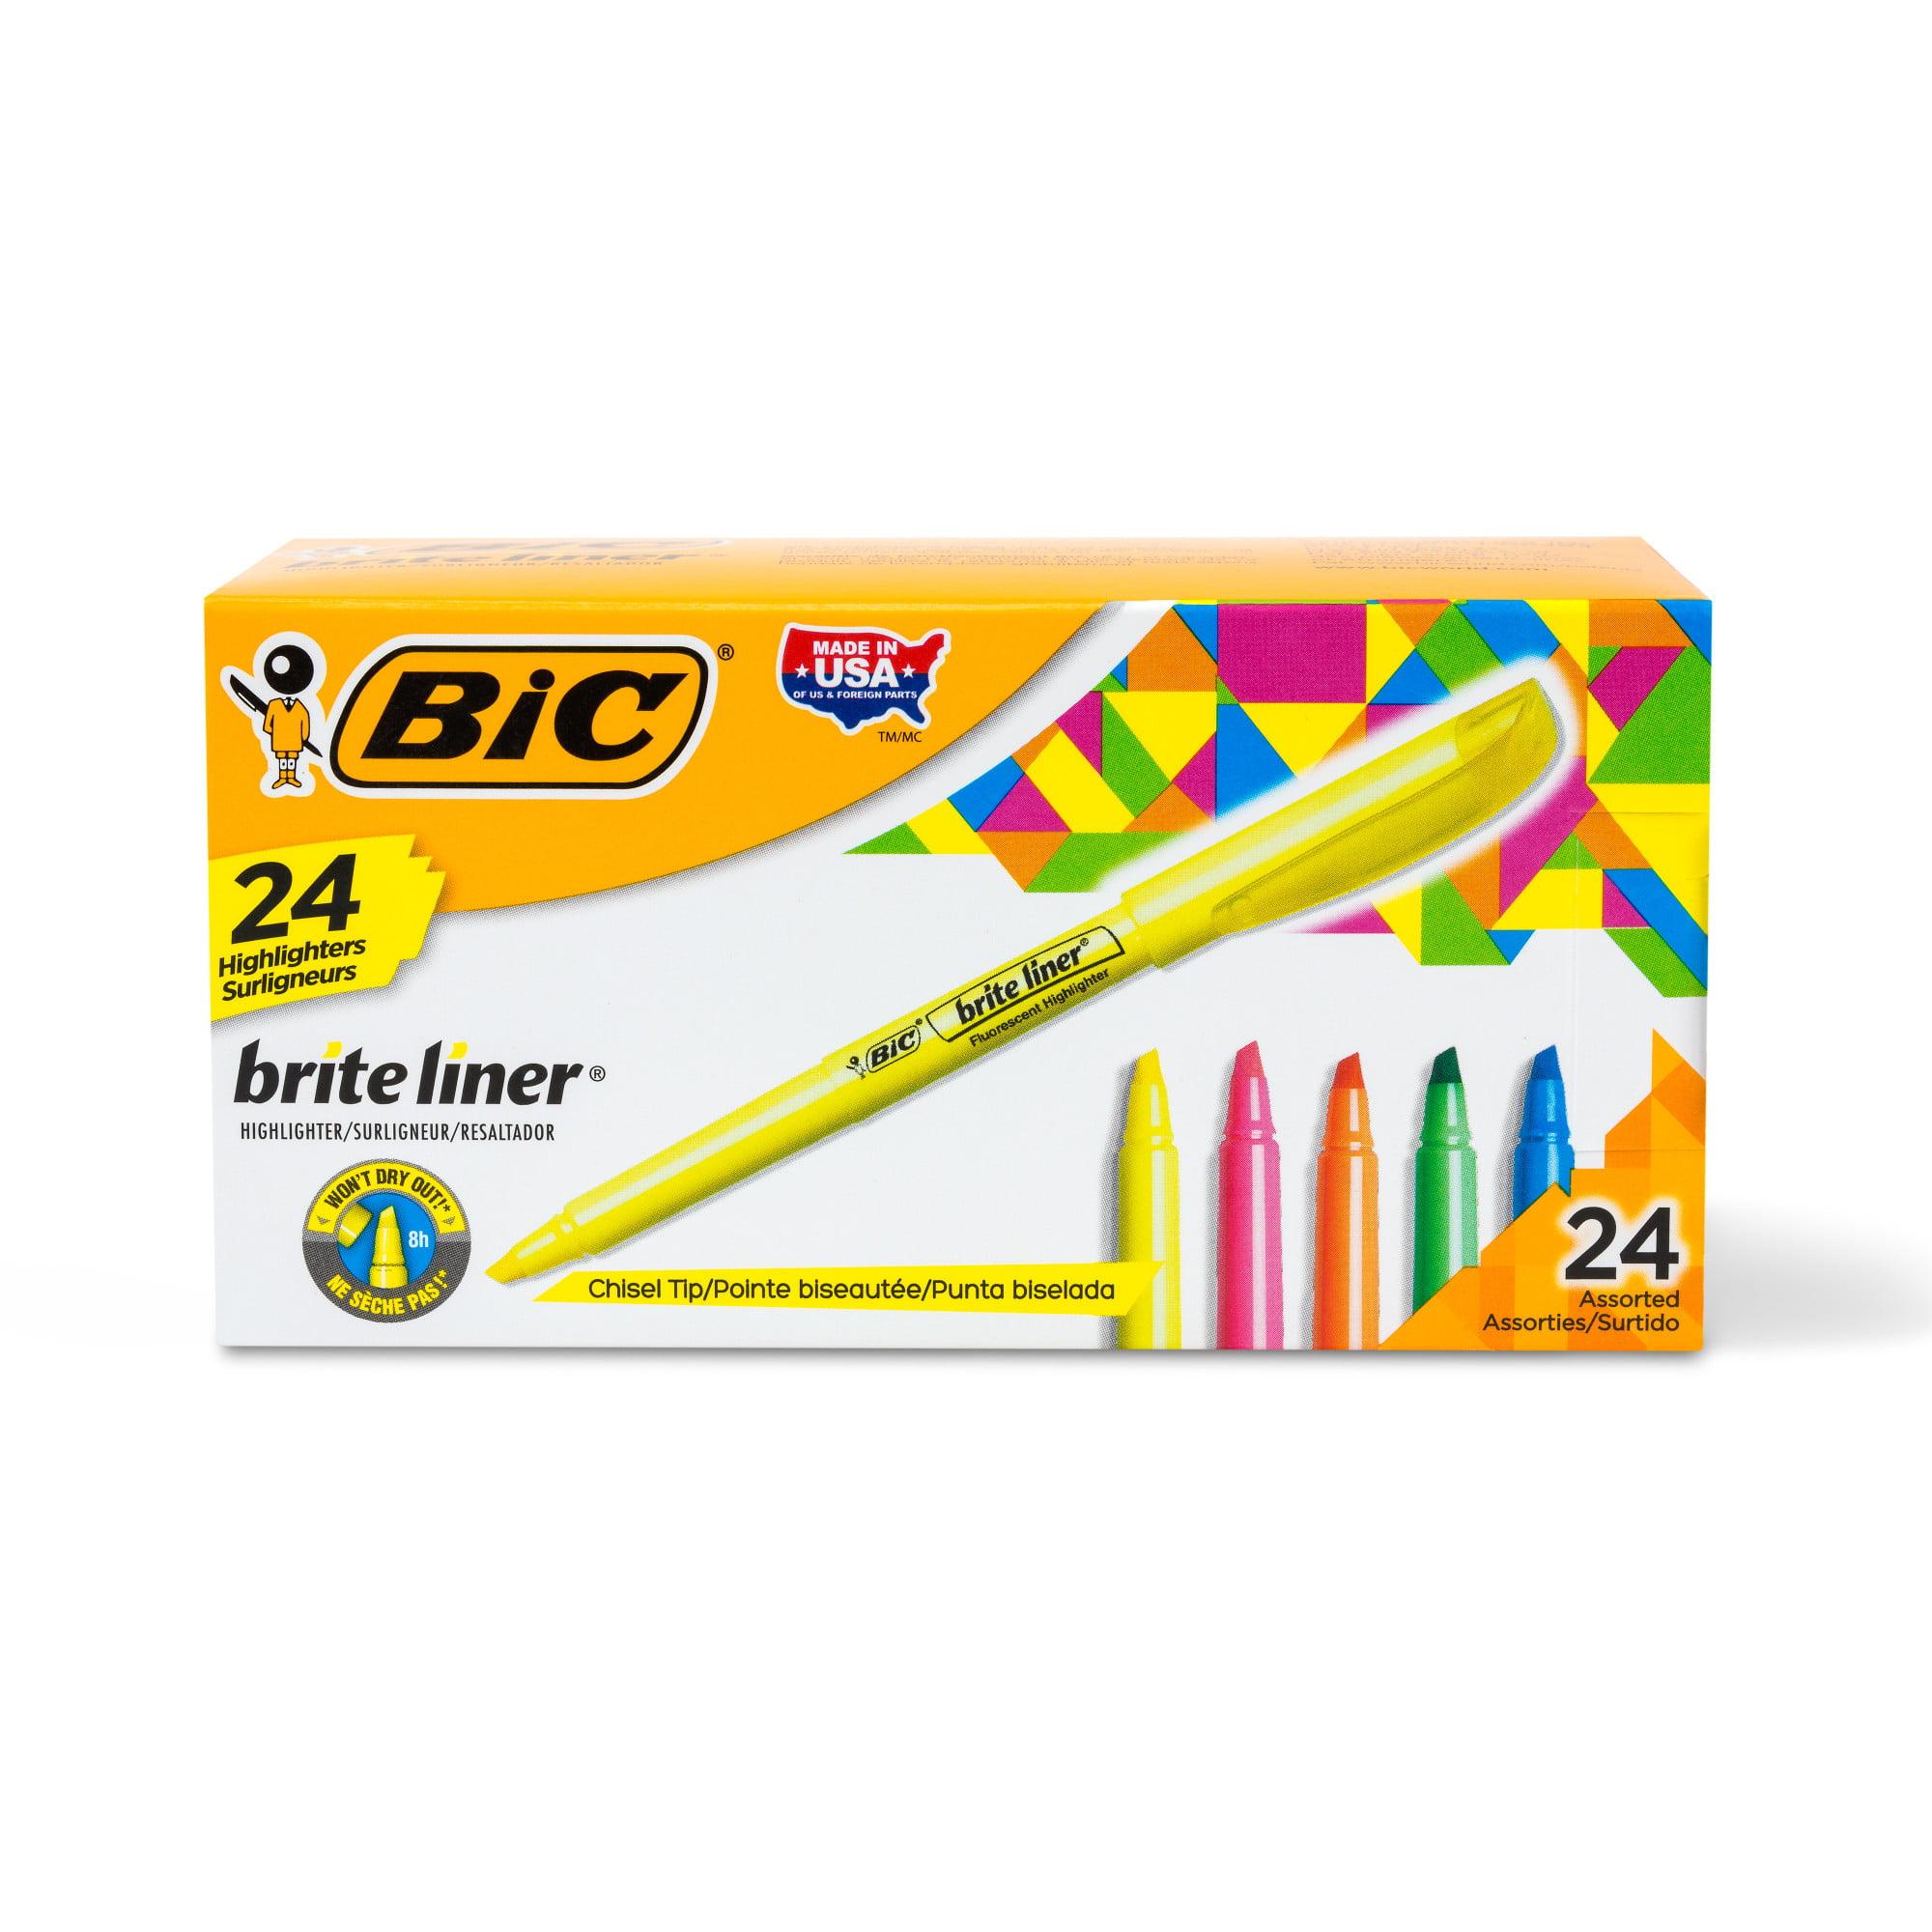 BIC Brite Liner Highlighter, Chisel Tip, Assorted Colors, 24 Count